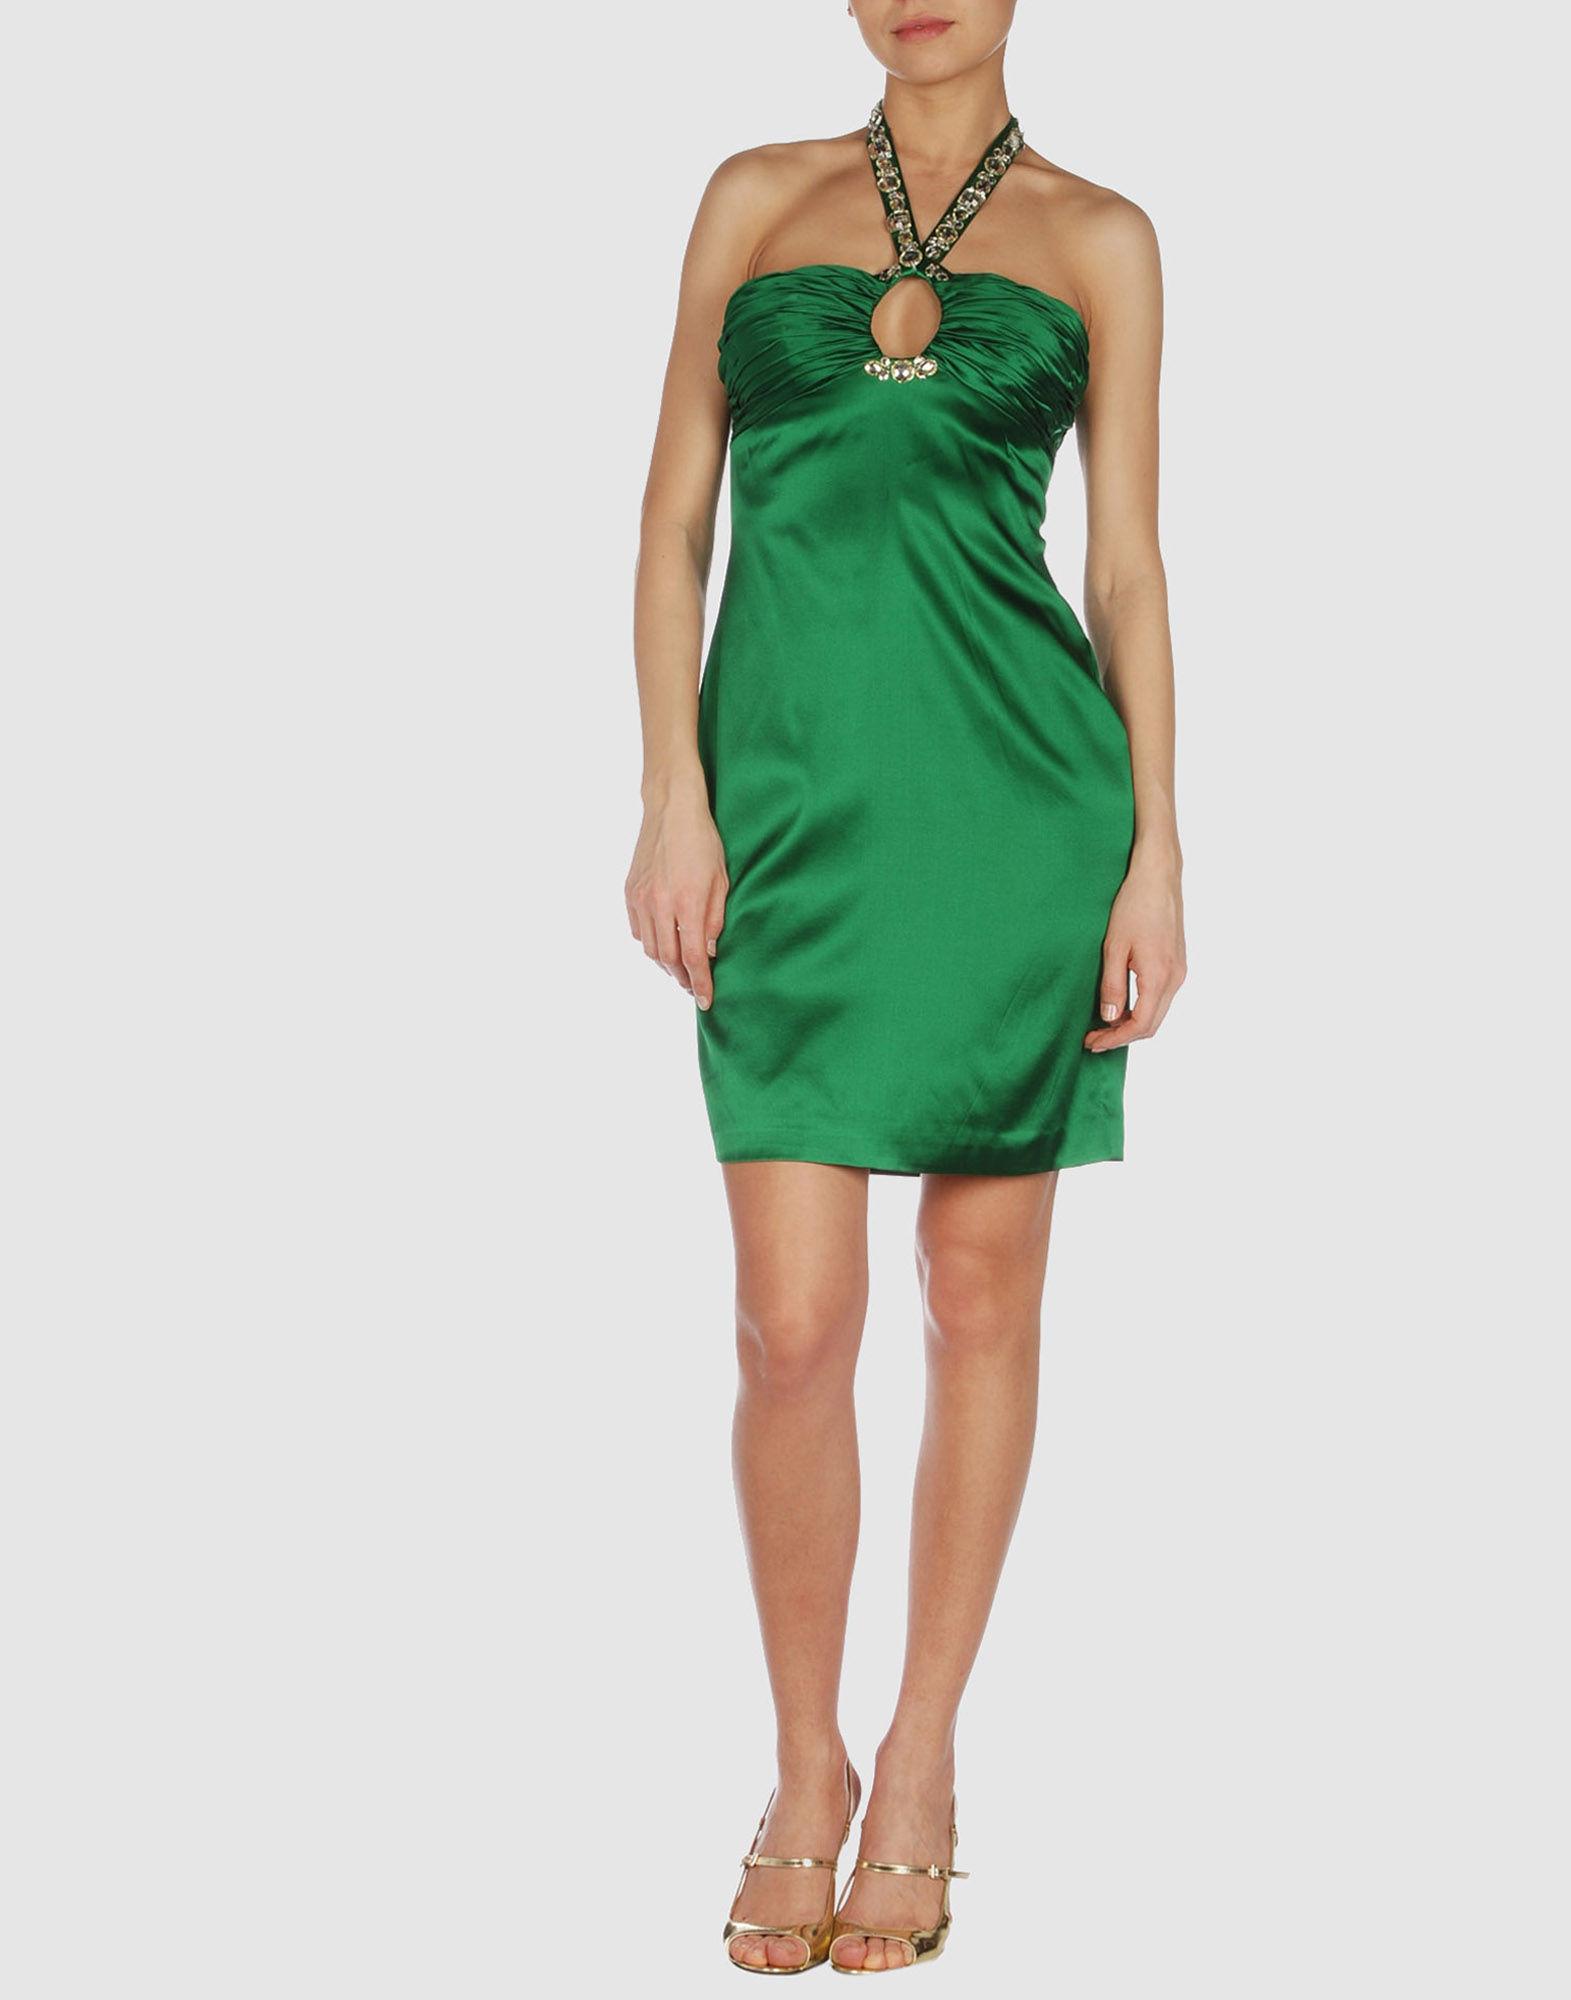 basix black label short dress in green emerald green lyst